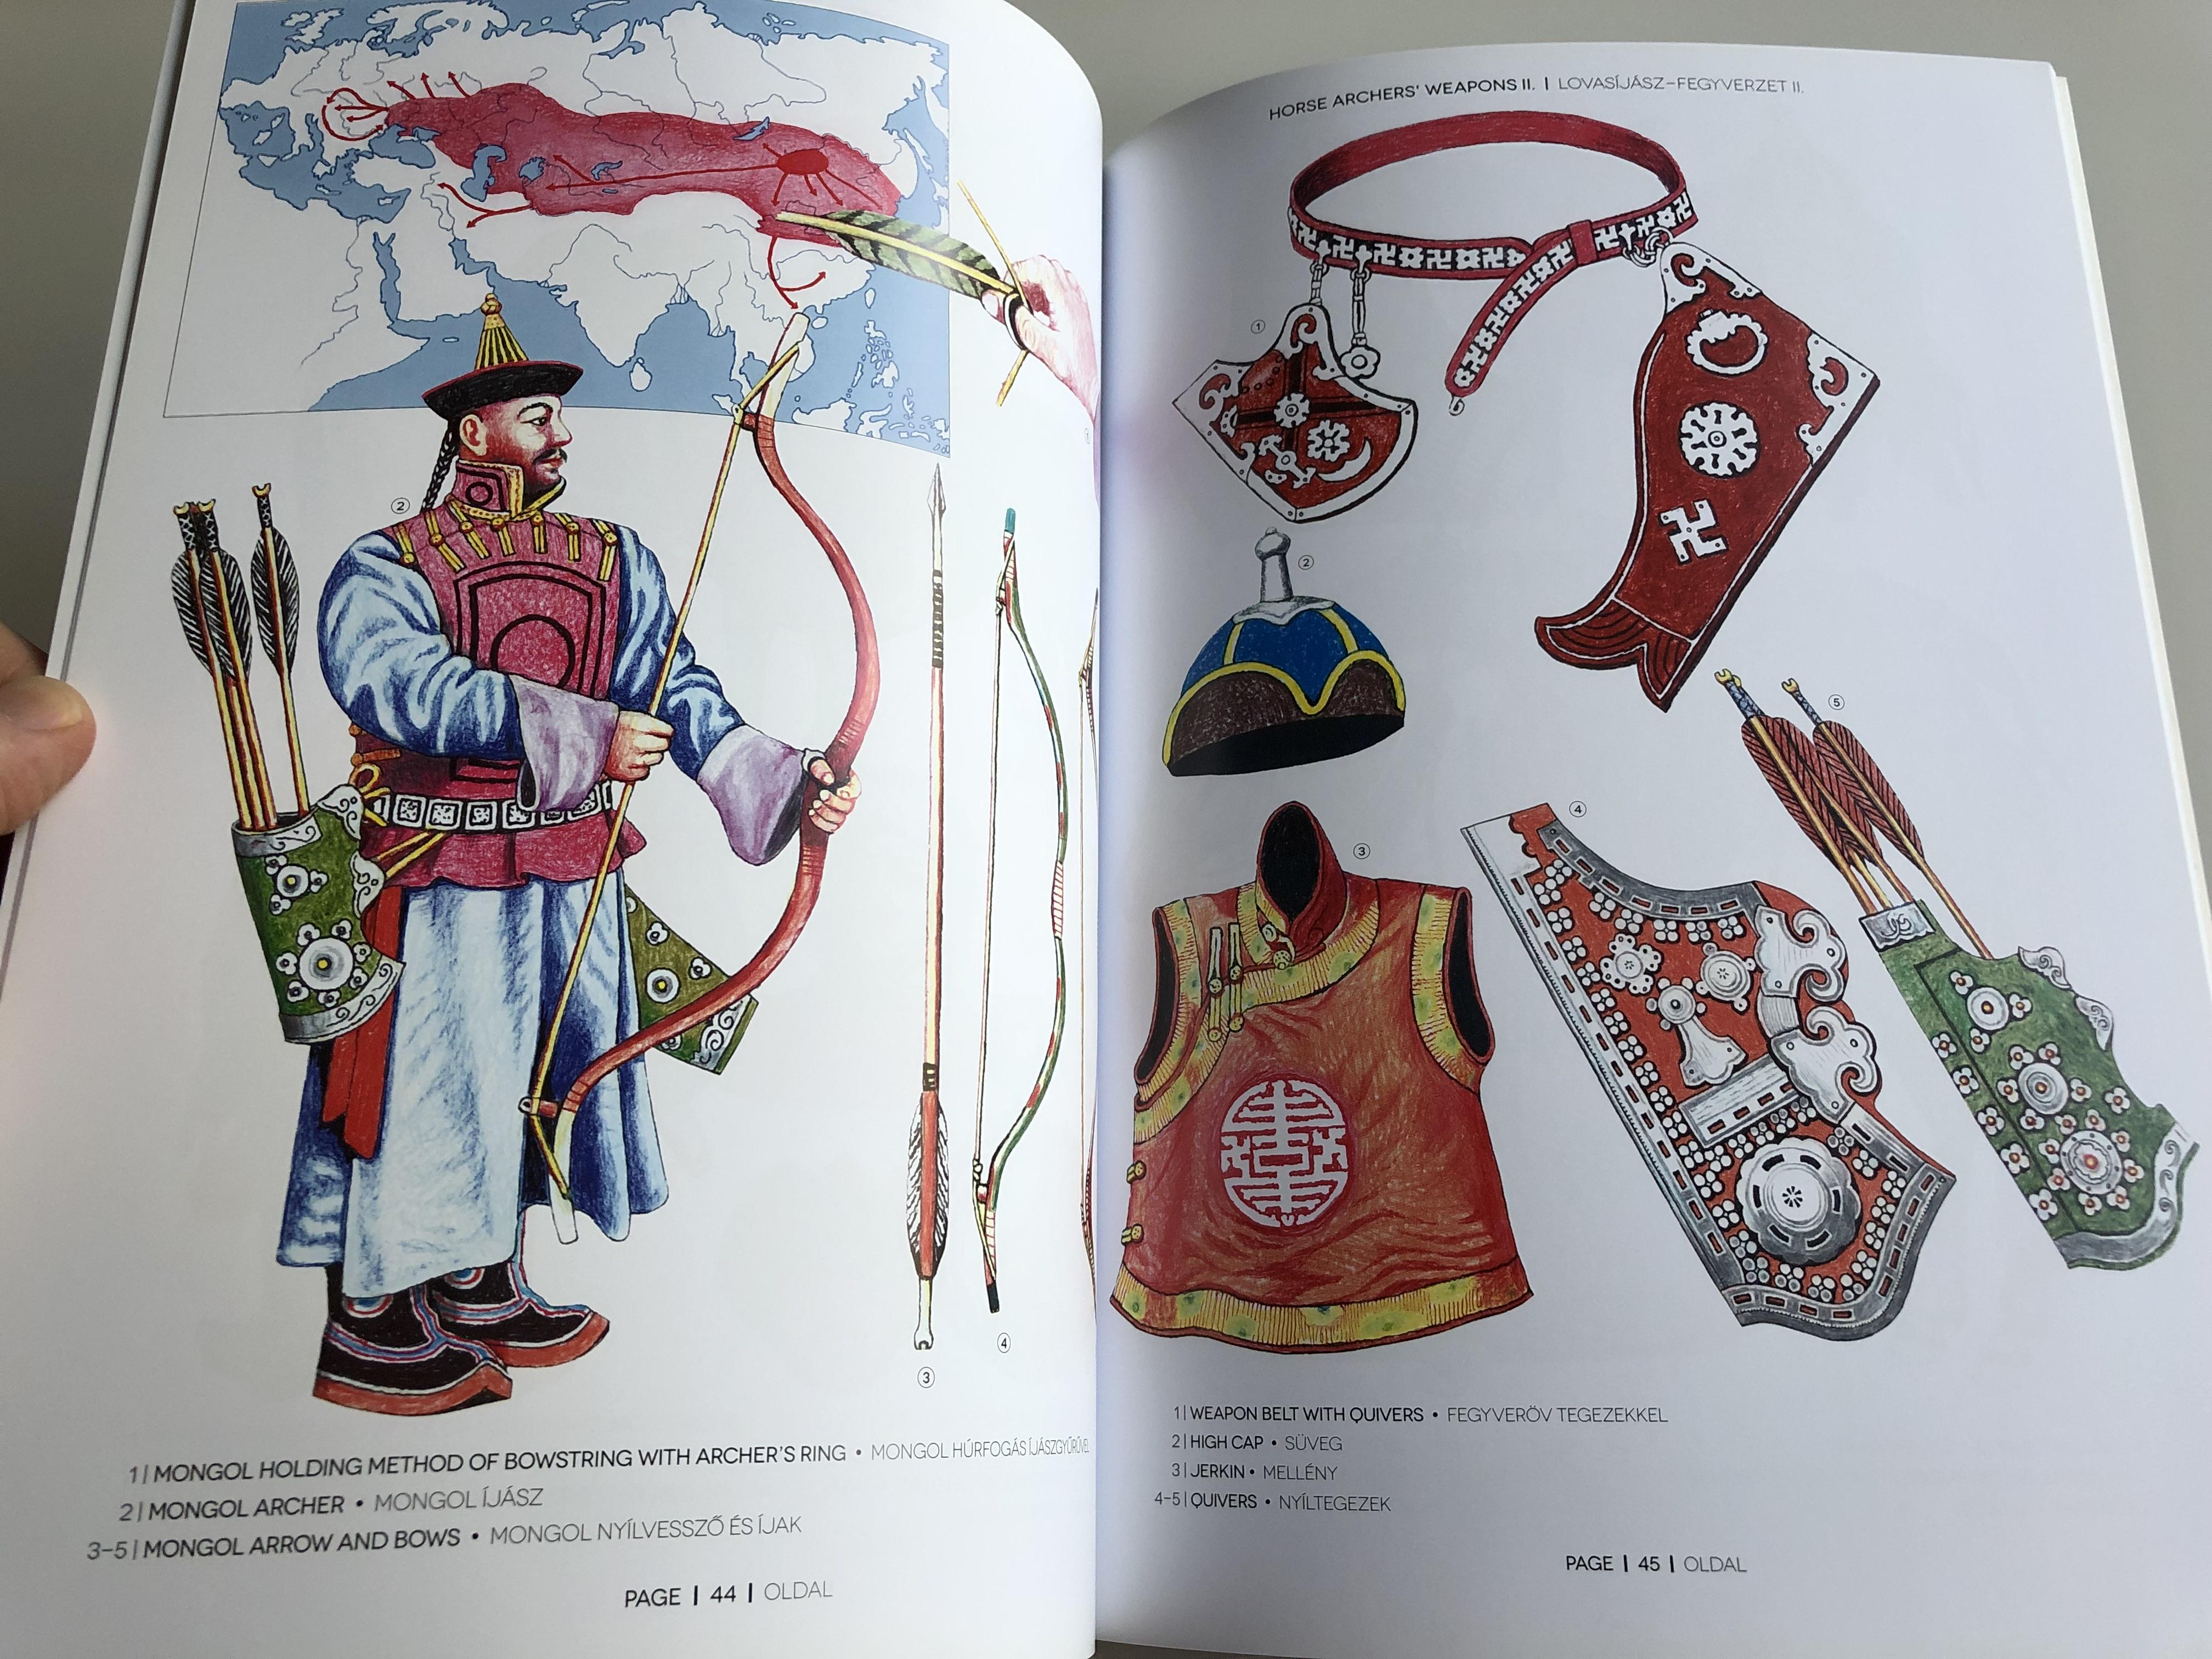 horse-archers-weapons-ii.-by-gy-z-somogyi-lovas-j-sz-fegyverzet-ii.-a-millenium-in-the-military-egy-ezred-v-hadban-paperback-2016-hm-zr-nyi-7-.jpg